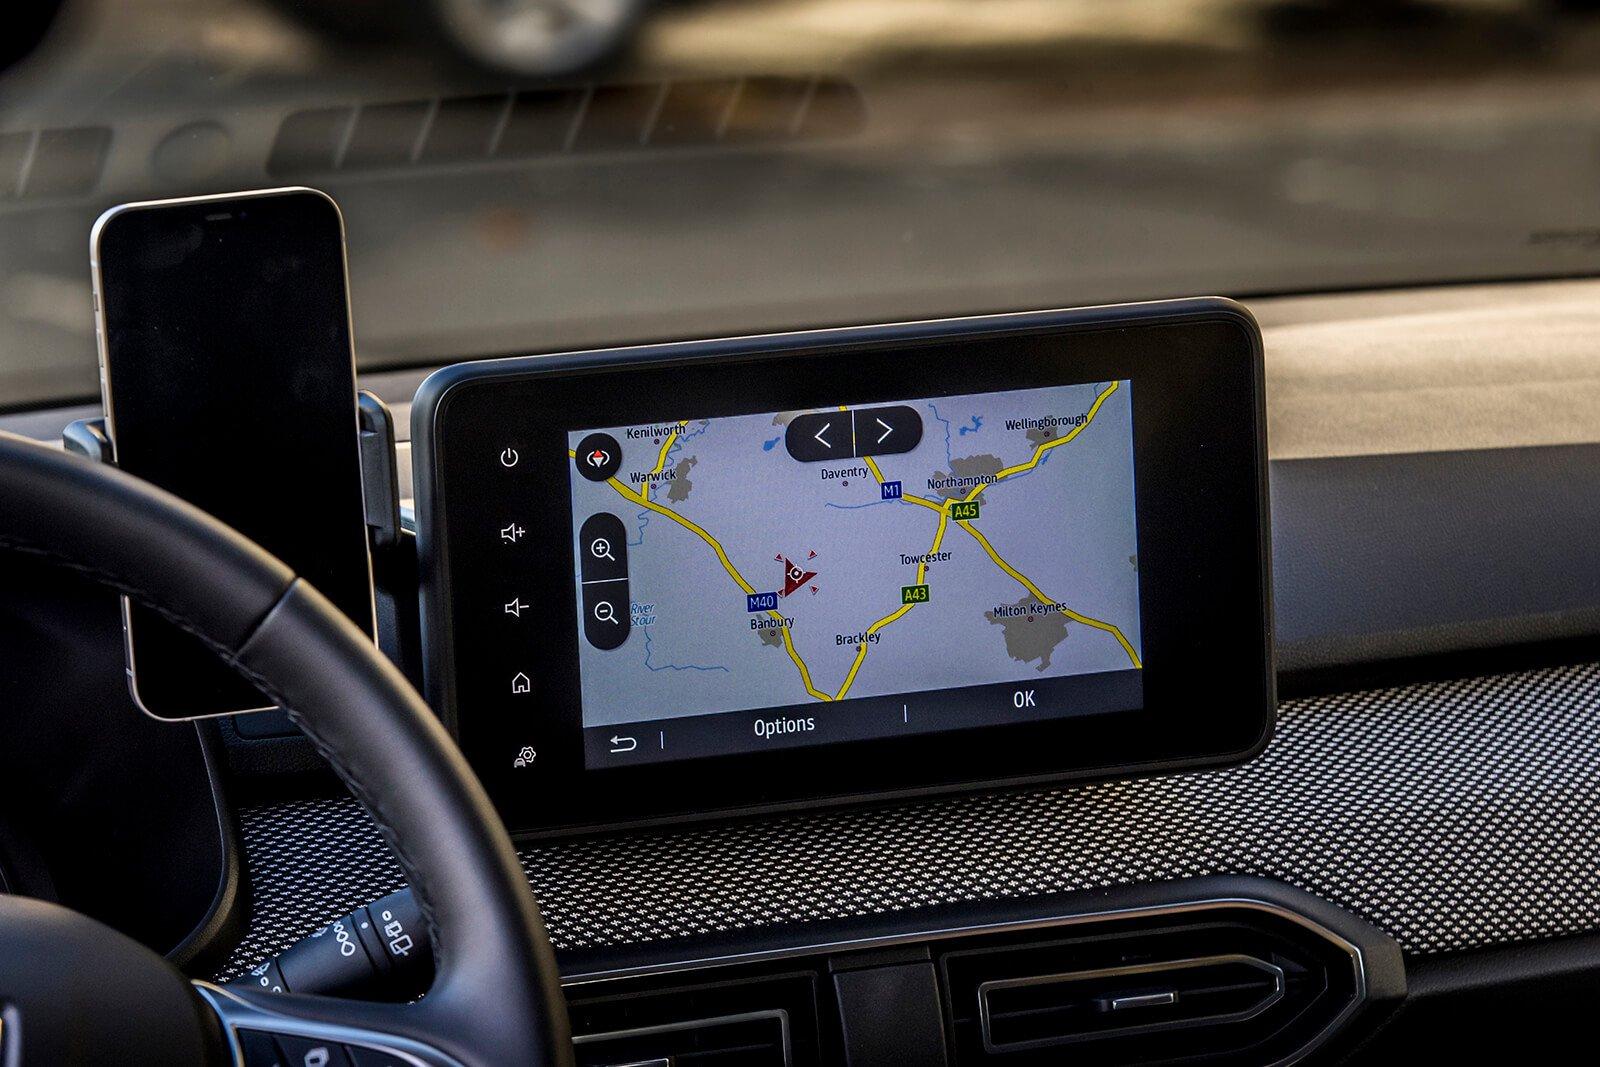 Dacia Sandero 2021 Infotainment with docked smartphone